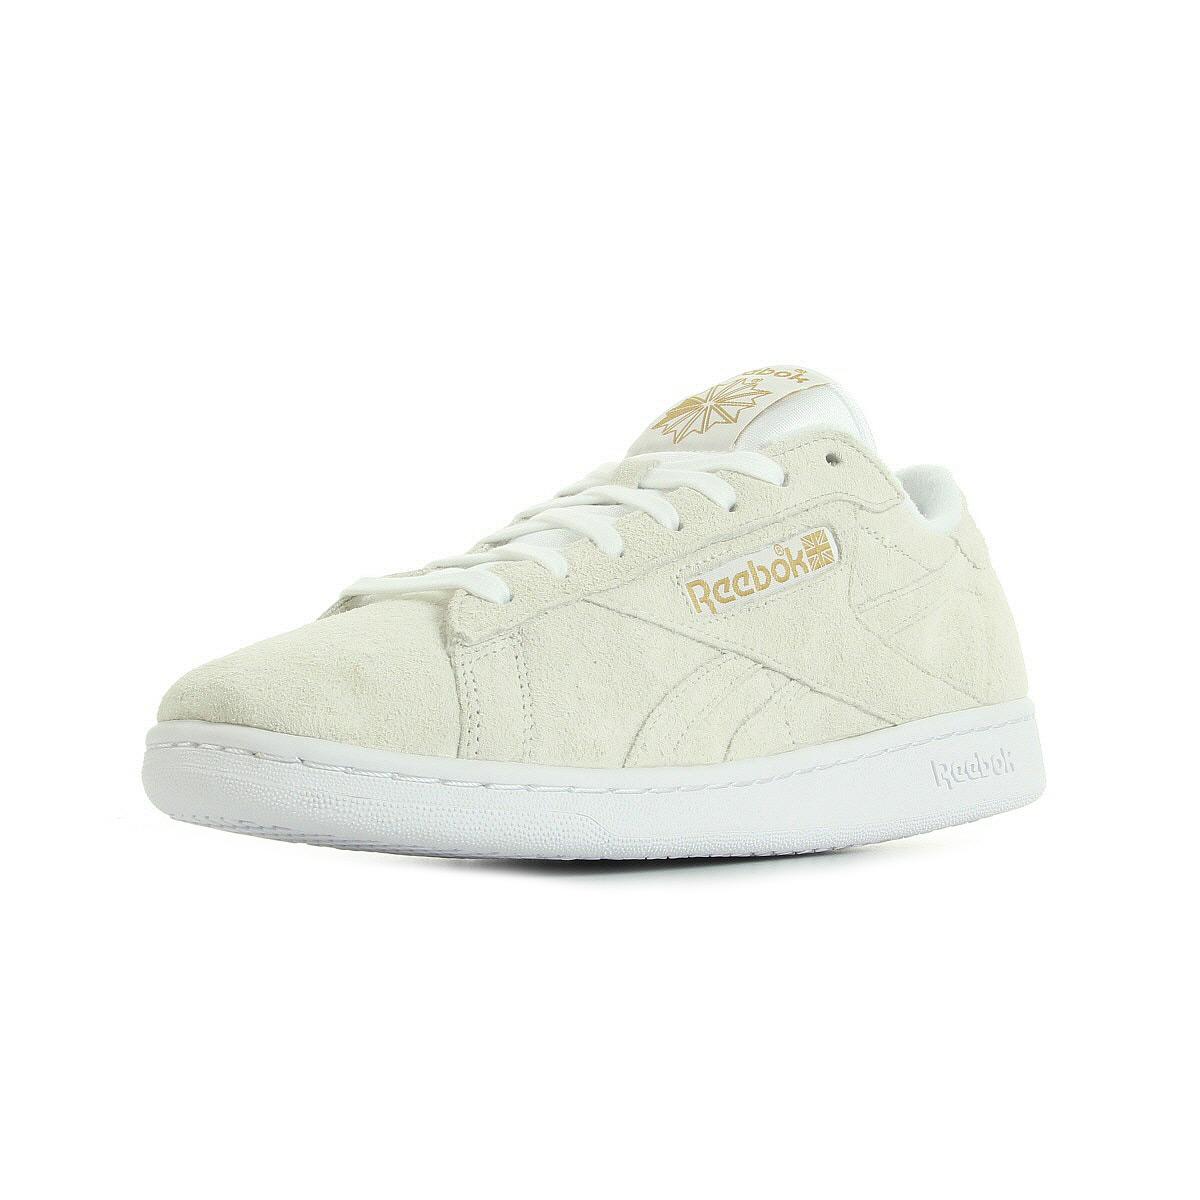 REEBOK Baskets NPC UK Perf Chaussures Homme CGKiSlJ6